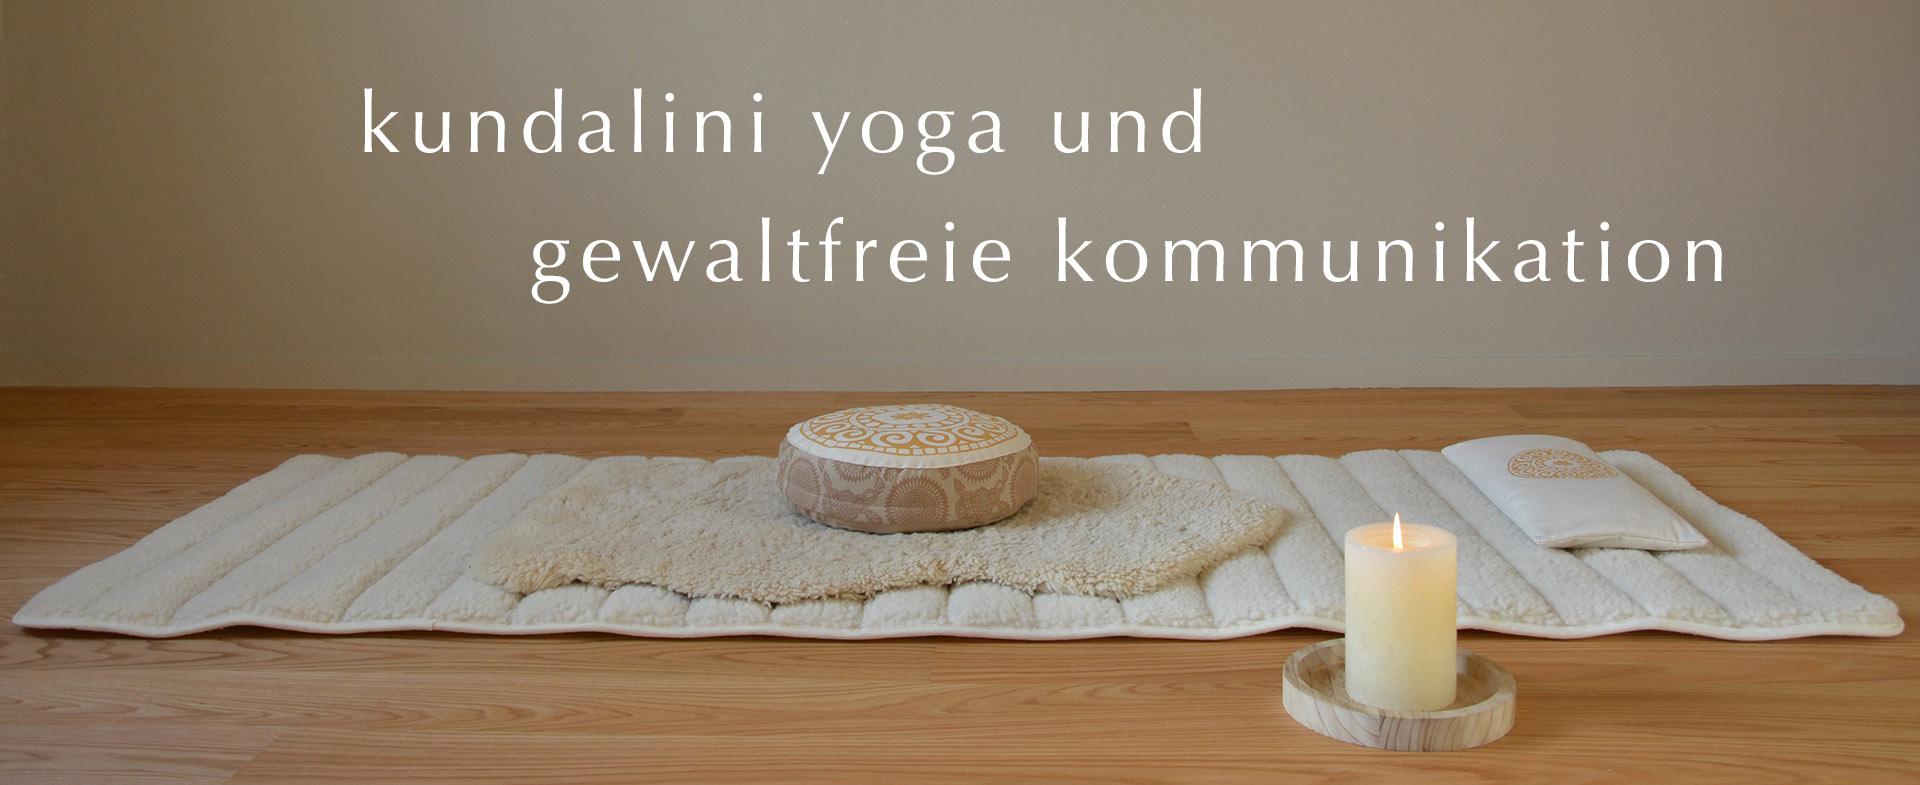 Yoga und Kommunikation